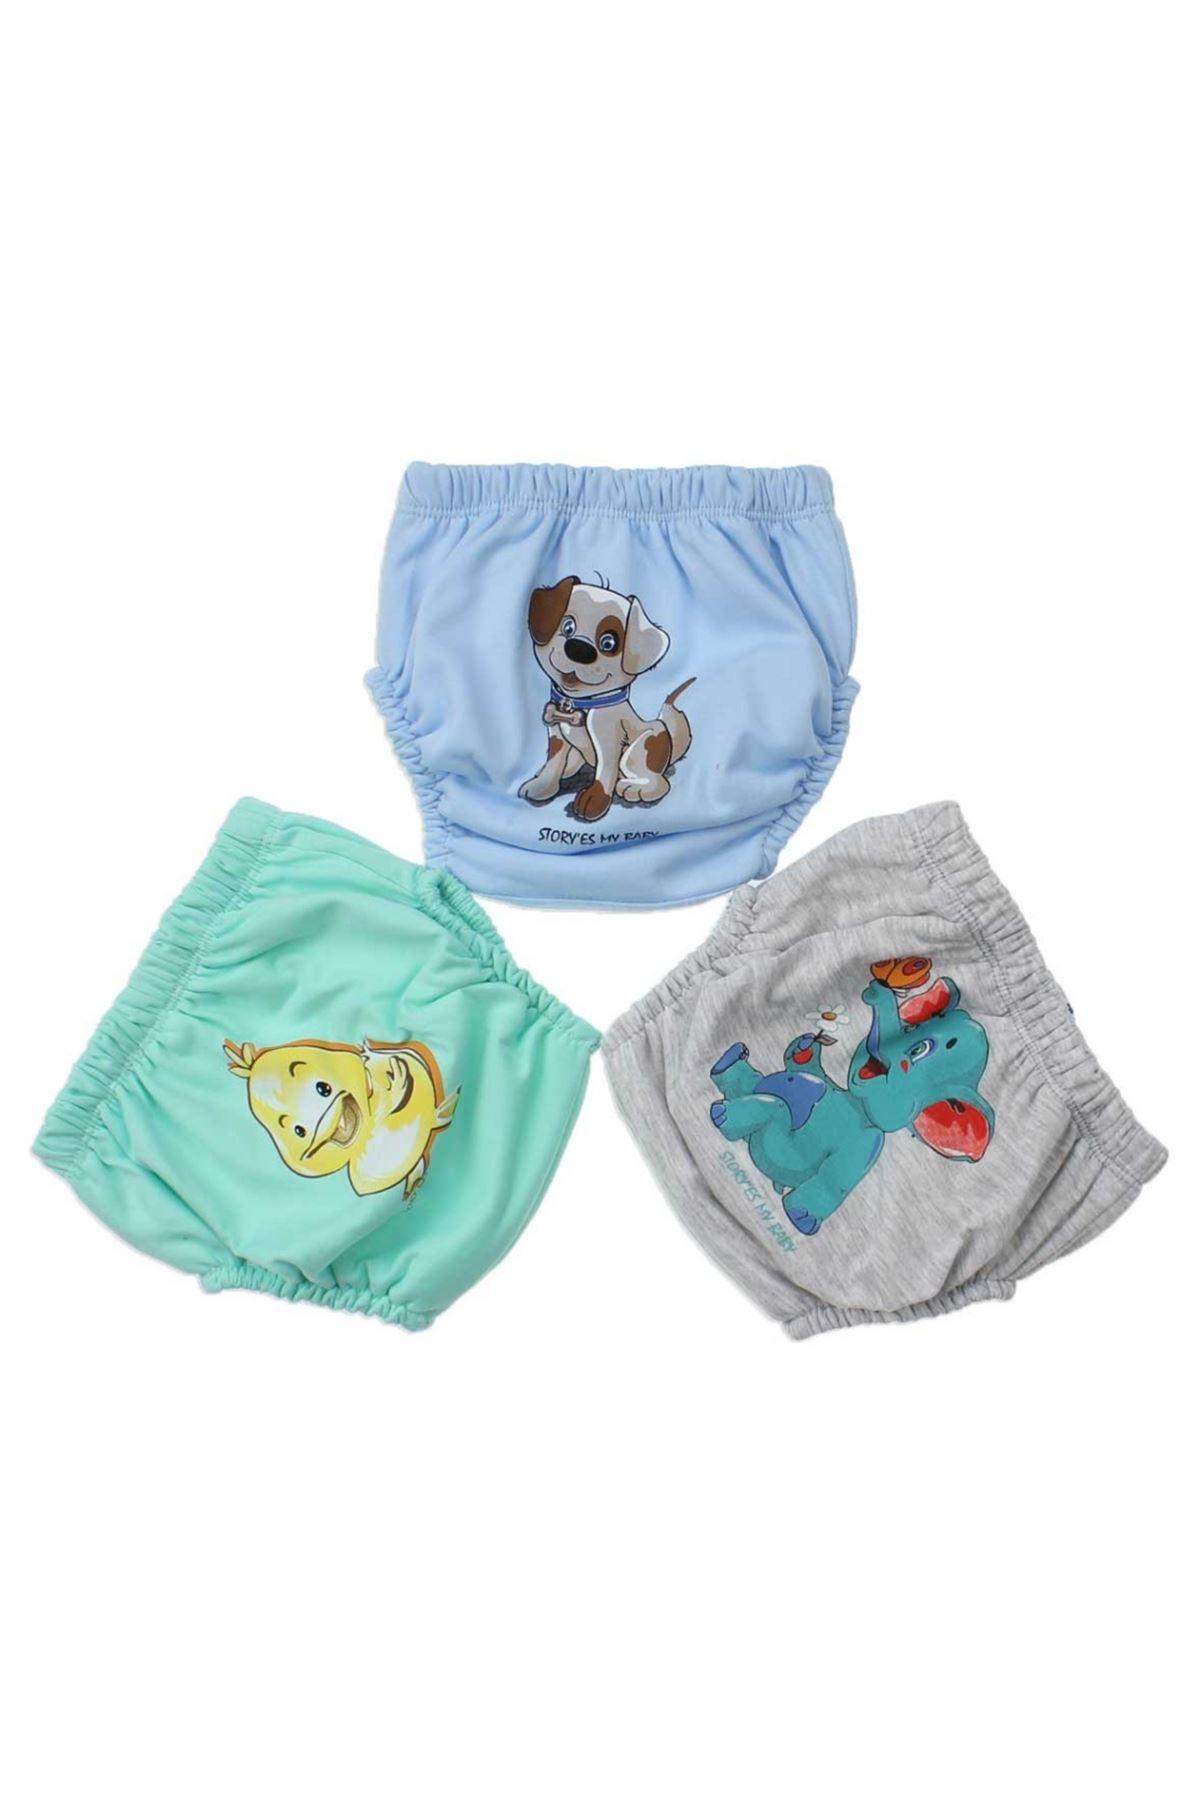 Baby Boy Girls Training Panty Underwear 3 Piece Set Initial Potty Training Men Boys Babies Cotton Training Panty Boxer Models